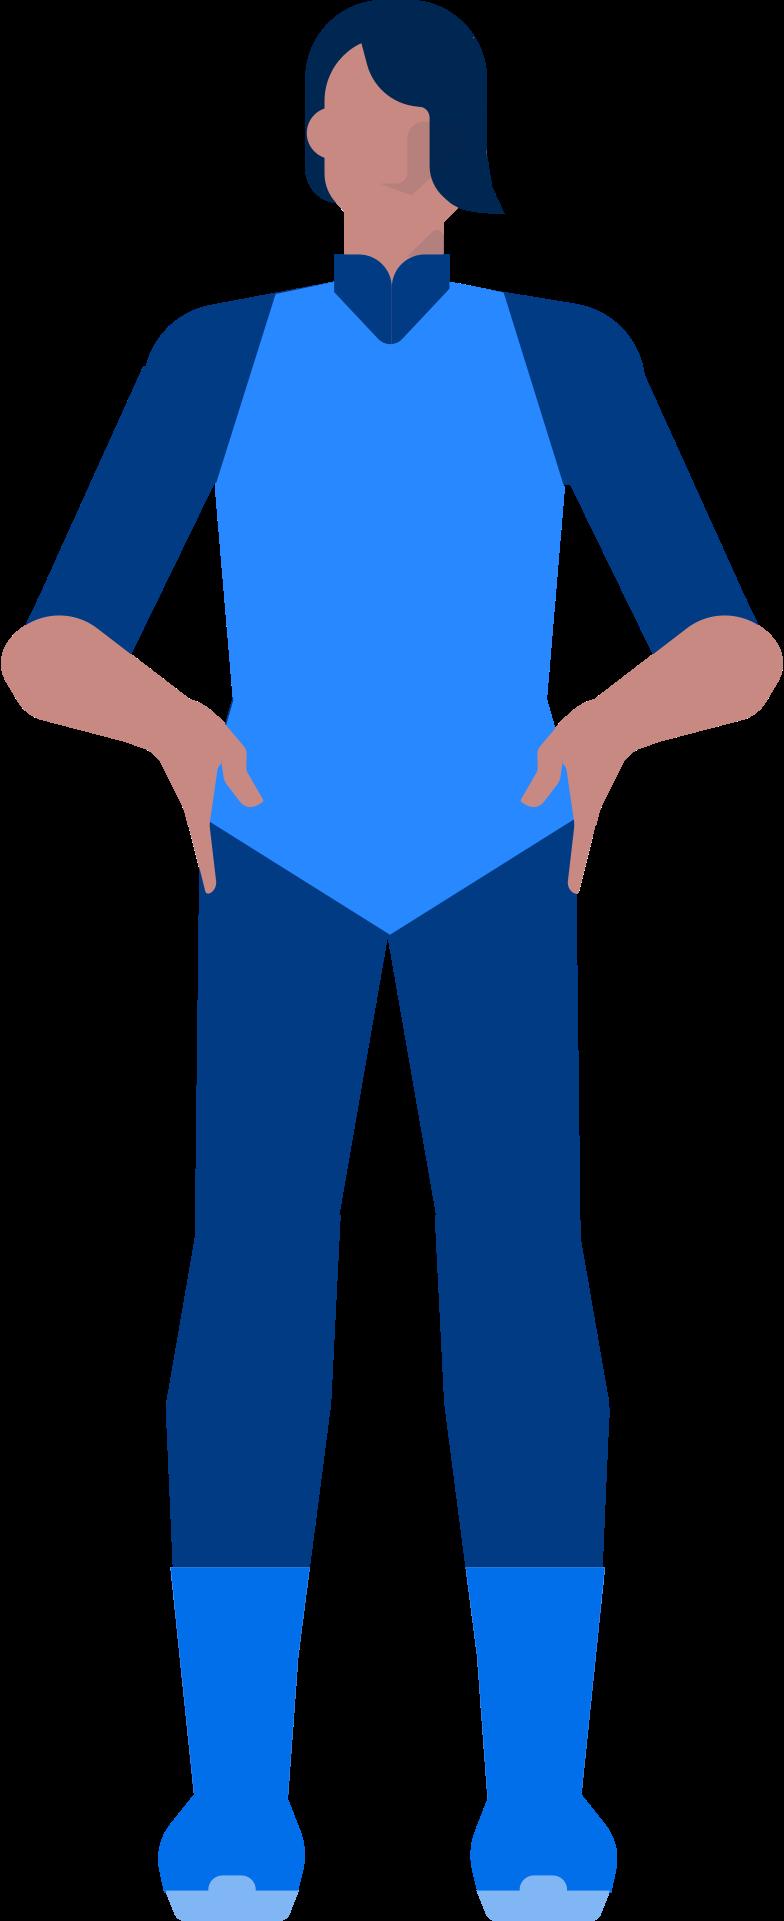 superhero Clipart illustration in PNG, SVG